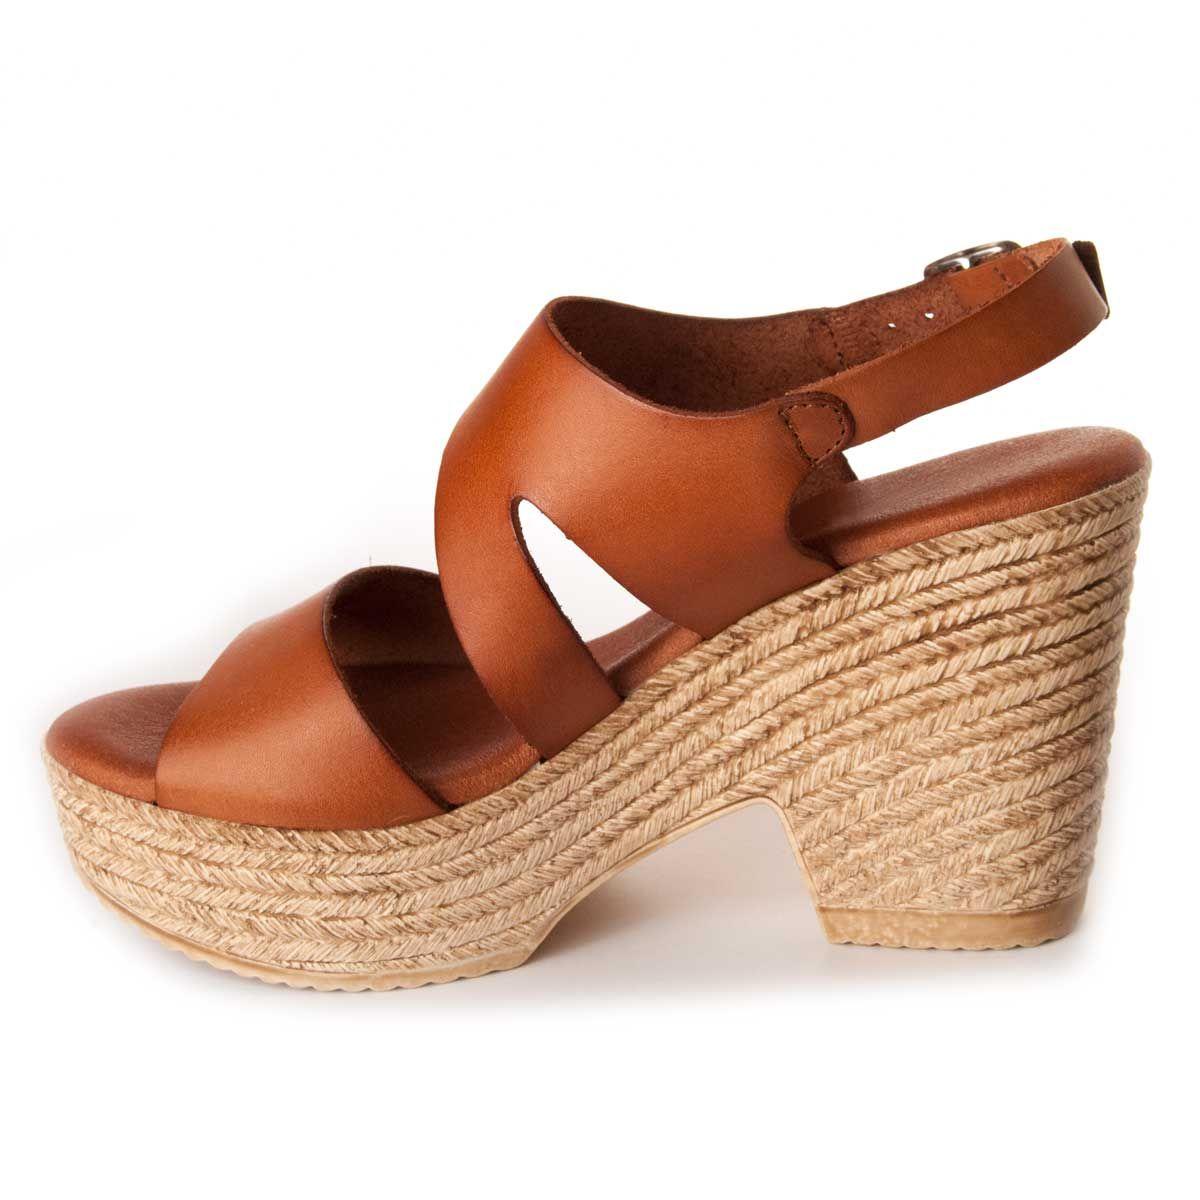 Leindia Platform Sandal in Camel